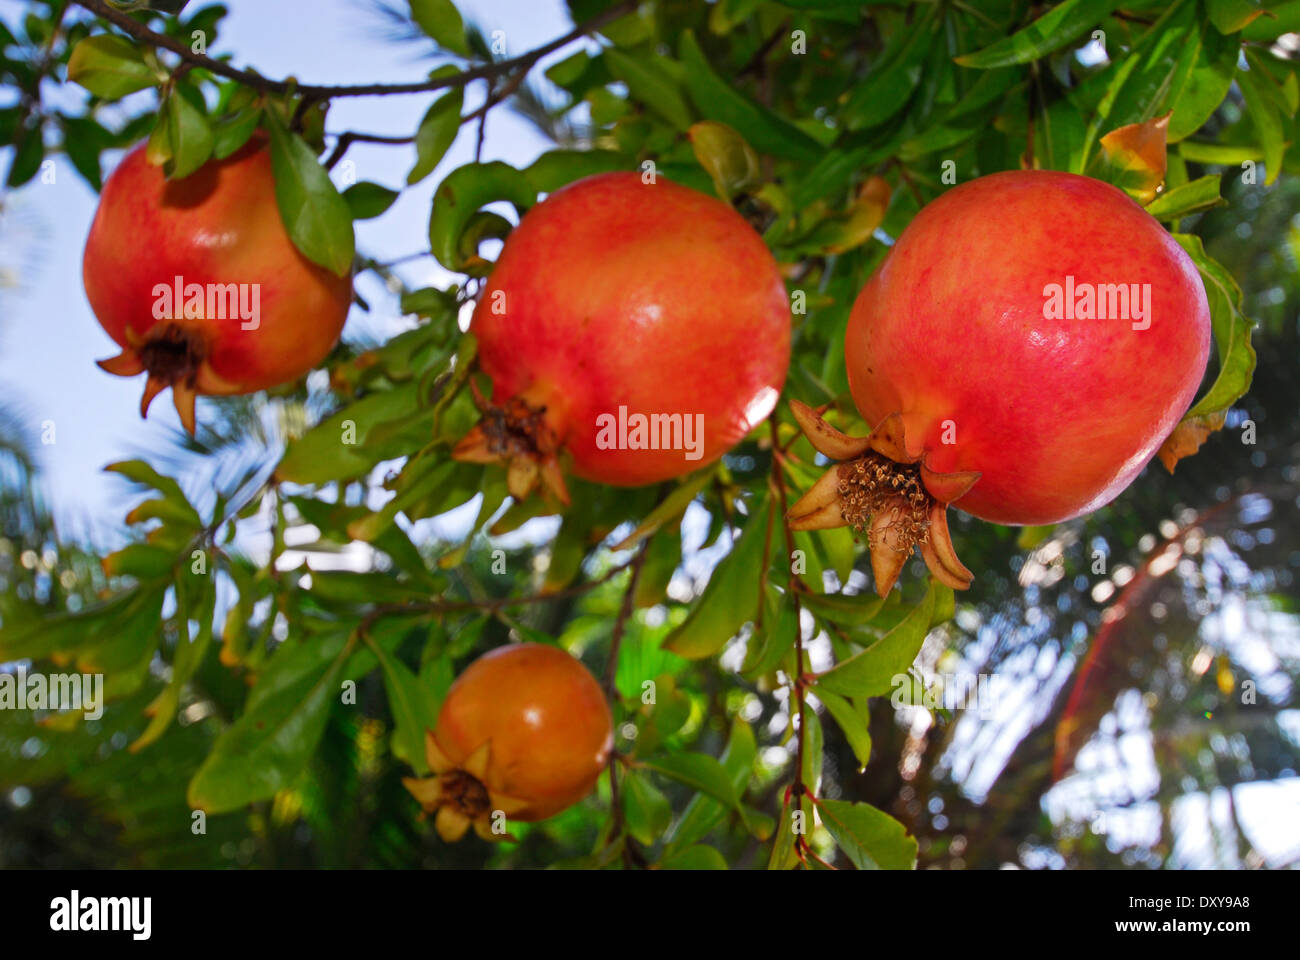 Pomegranates on tree, Israel - Stock Image